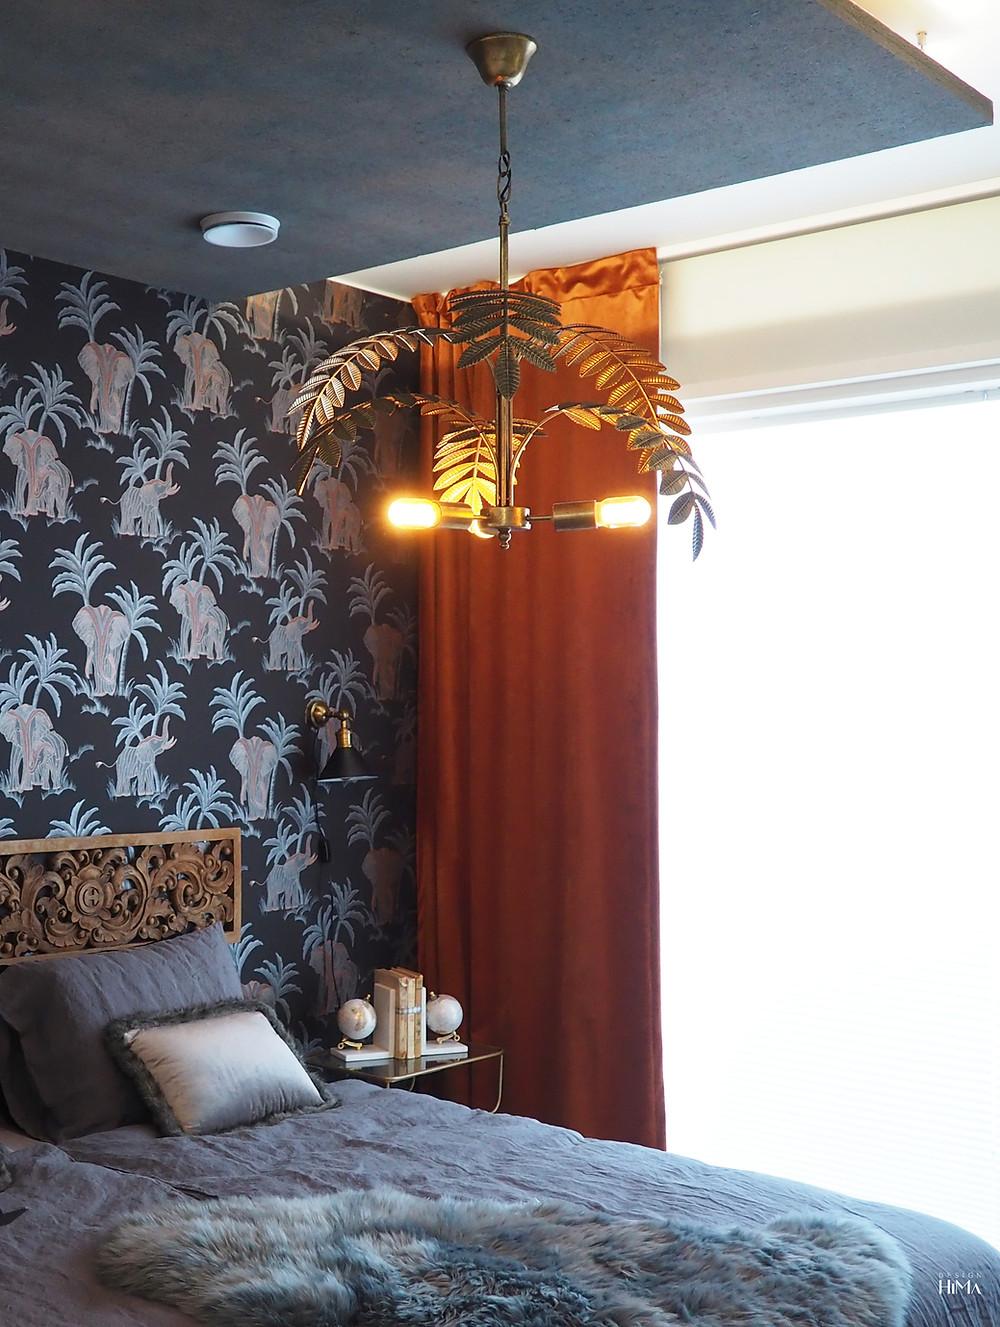 Omatalo Kulma makuuhuone